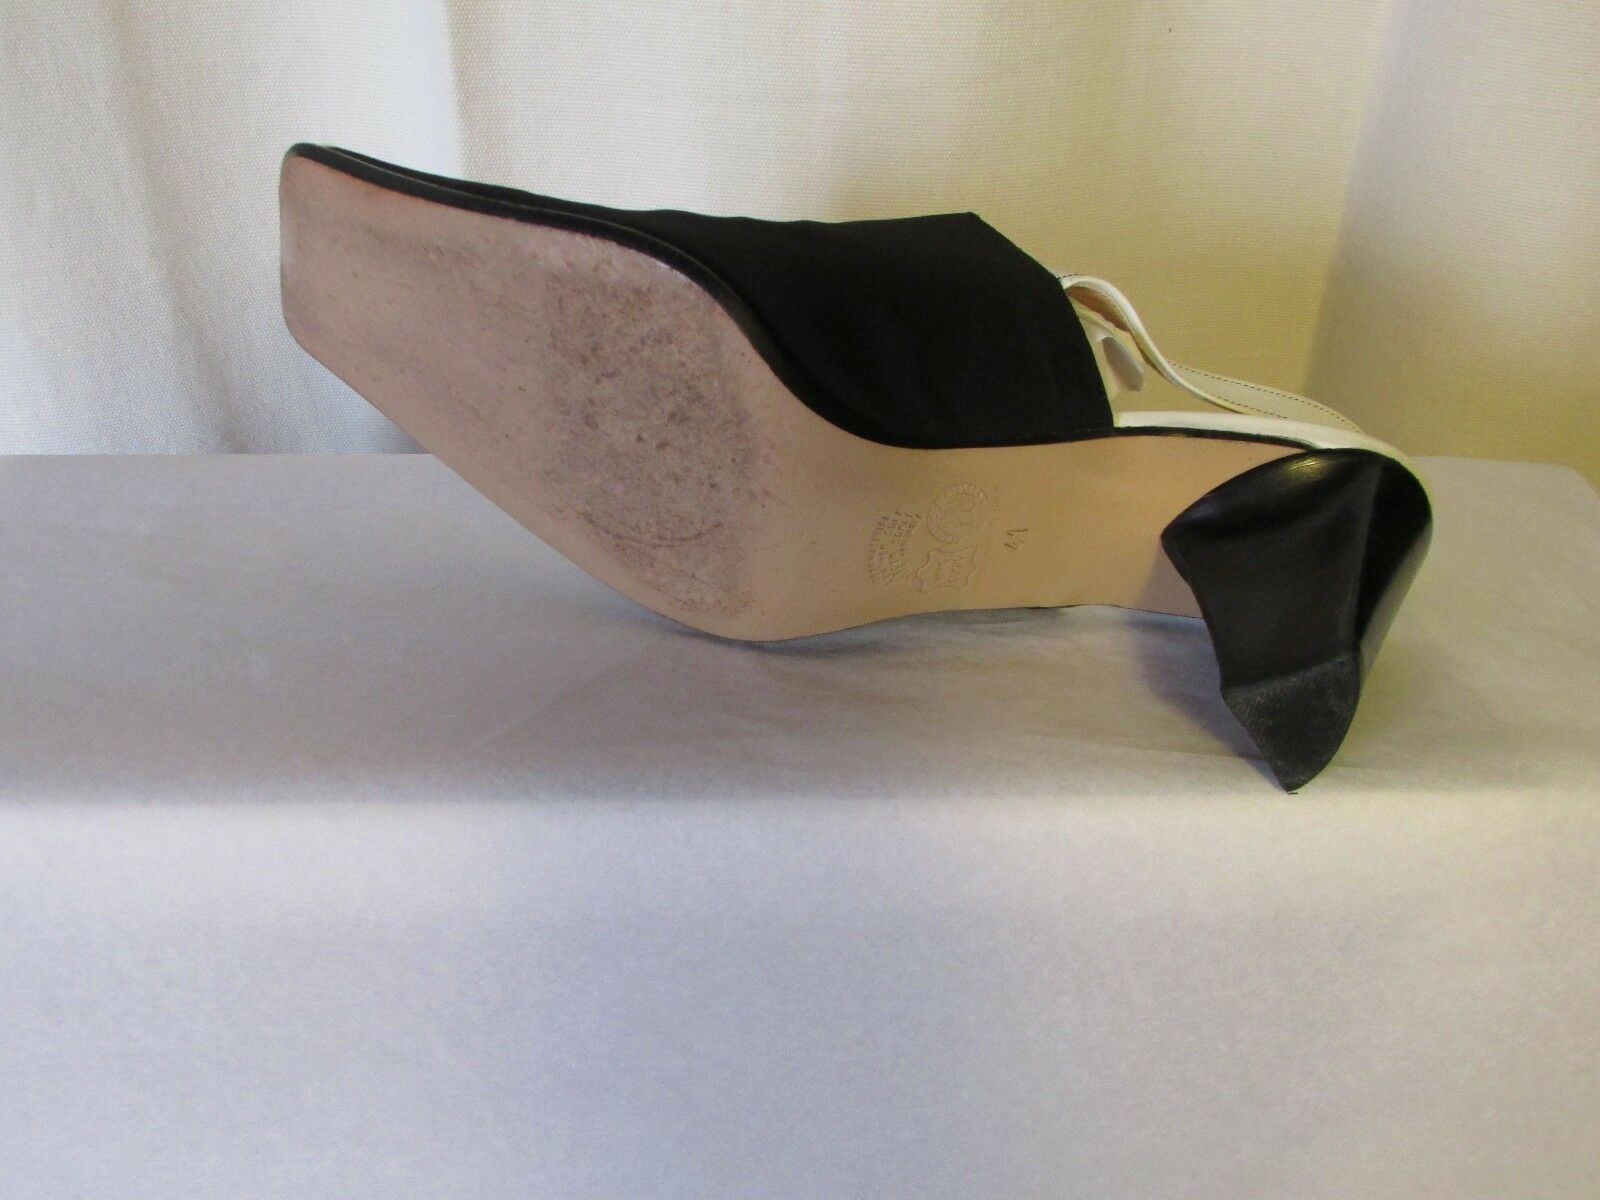 Escarpins Escarpins Escarpins IMMAGINI matière élastique blacke et cuir white 41 463428